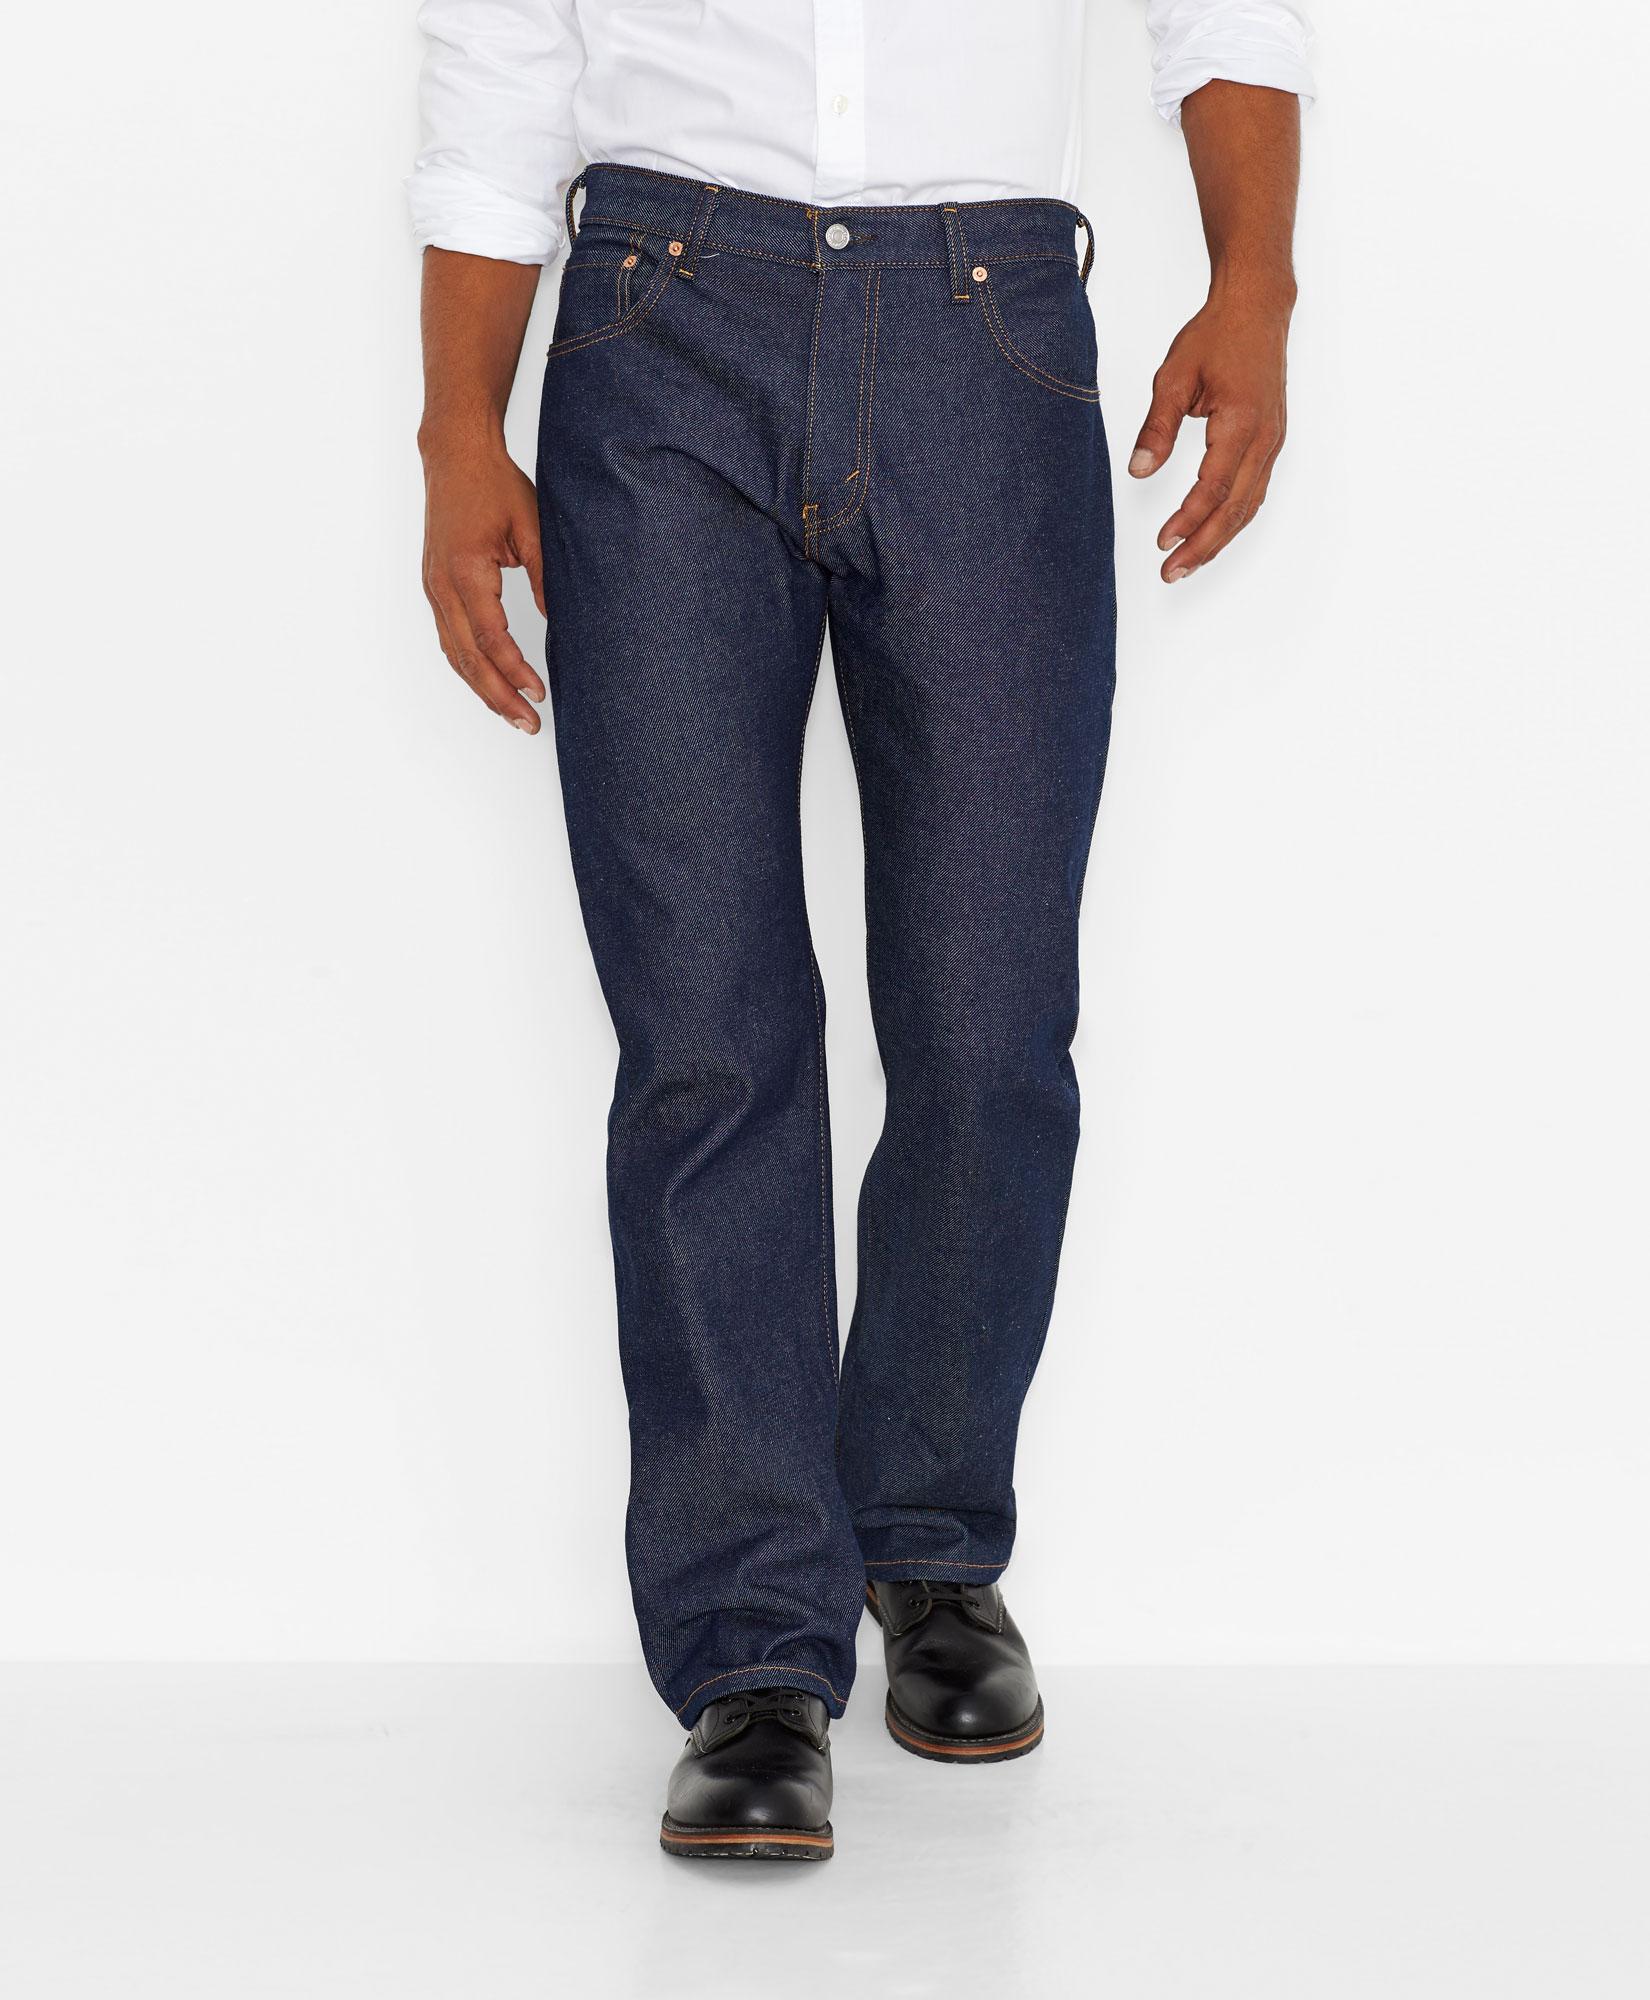 Skinny Jeans Wiki - Jeans Am